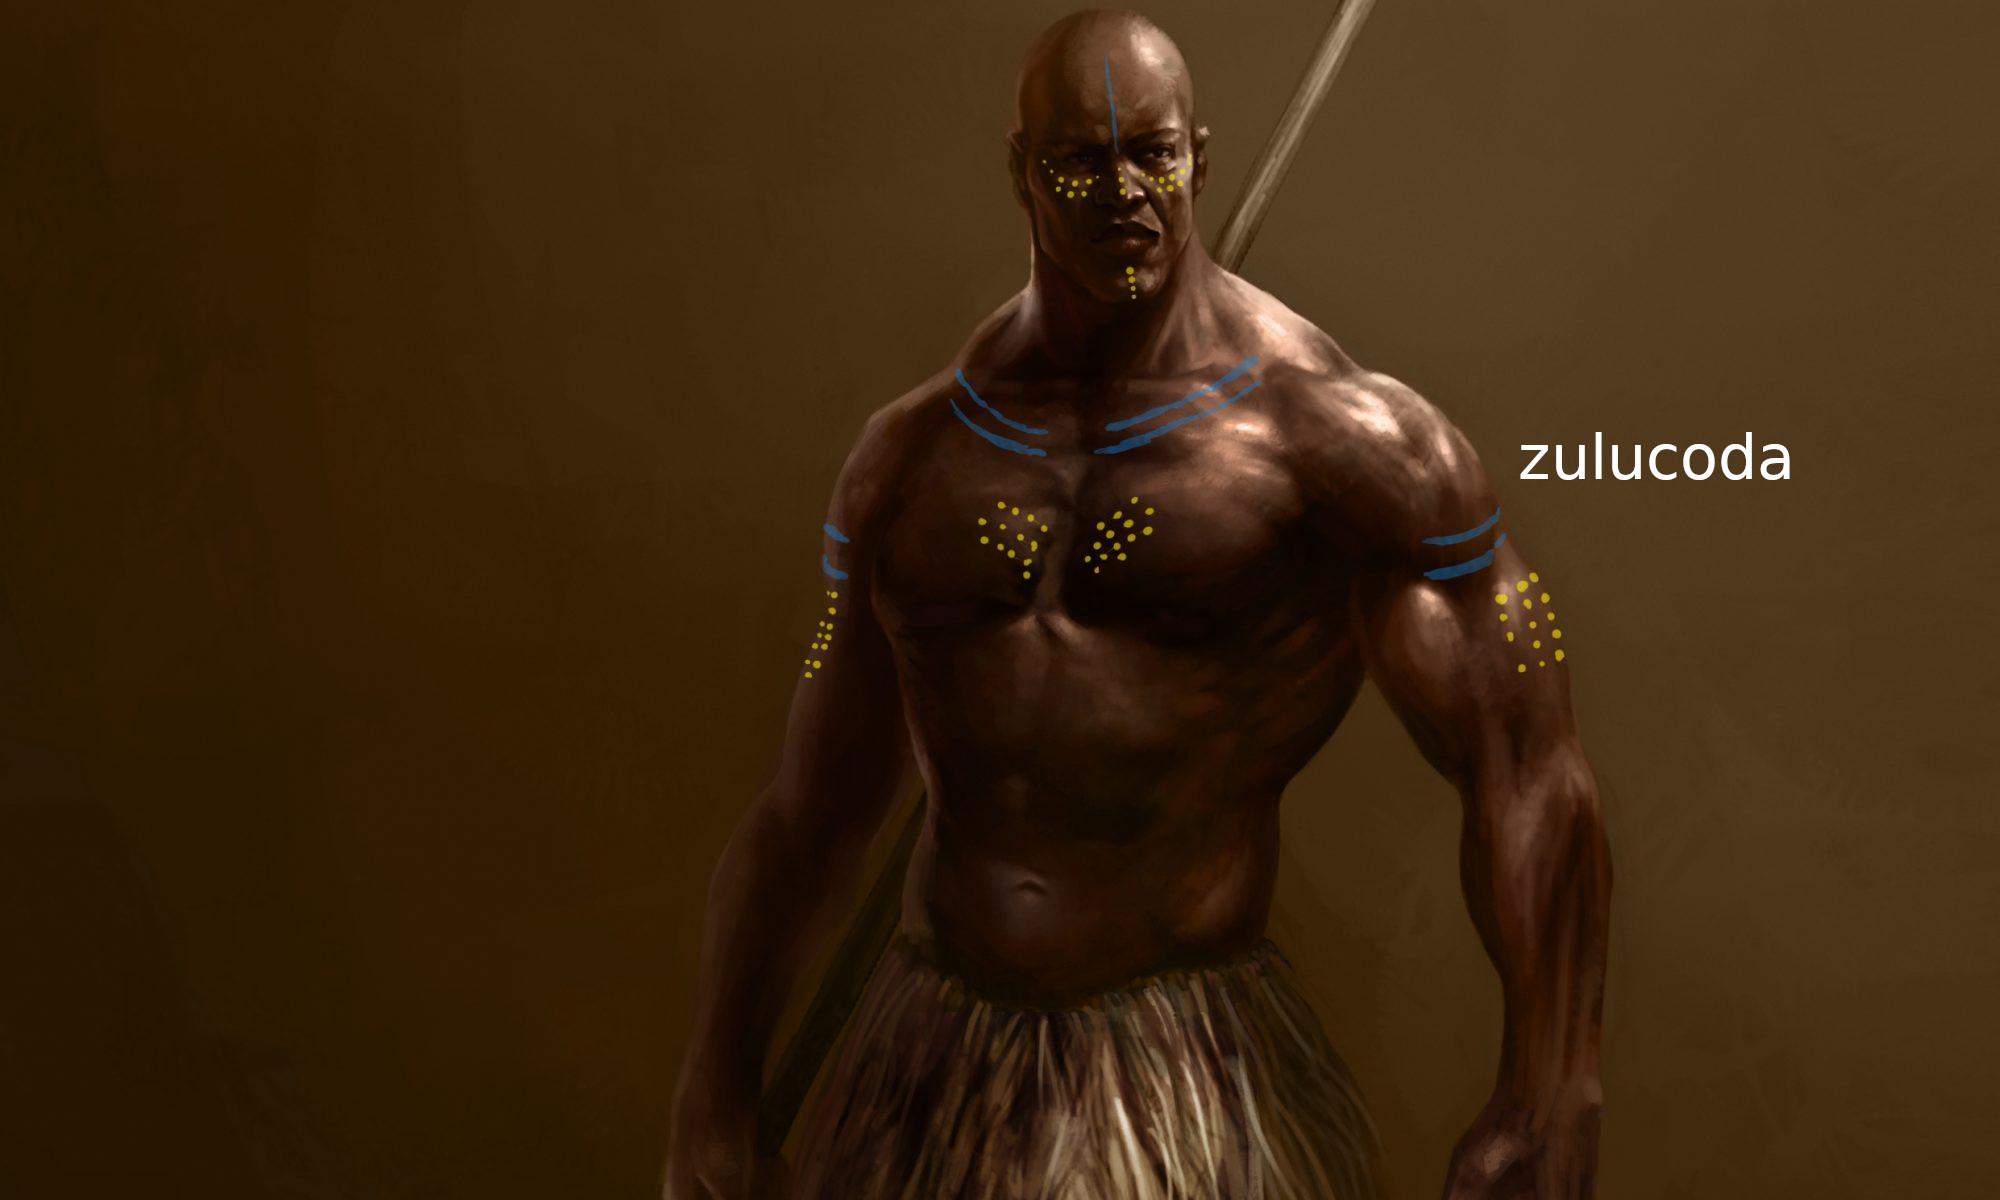 ZuluCoda